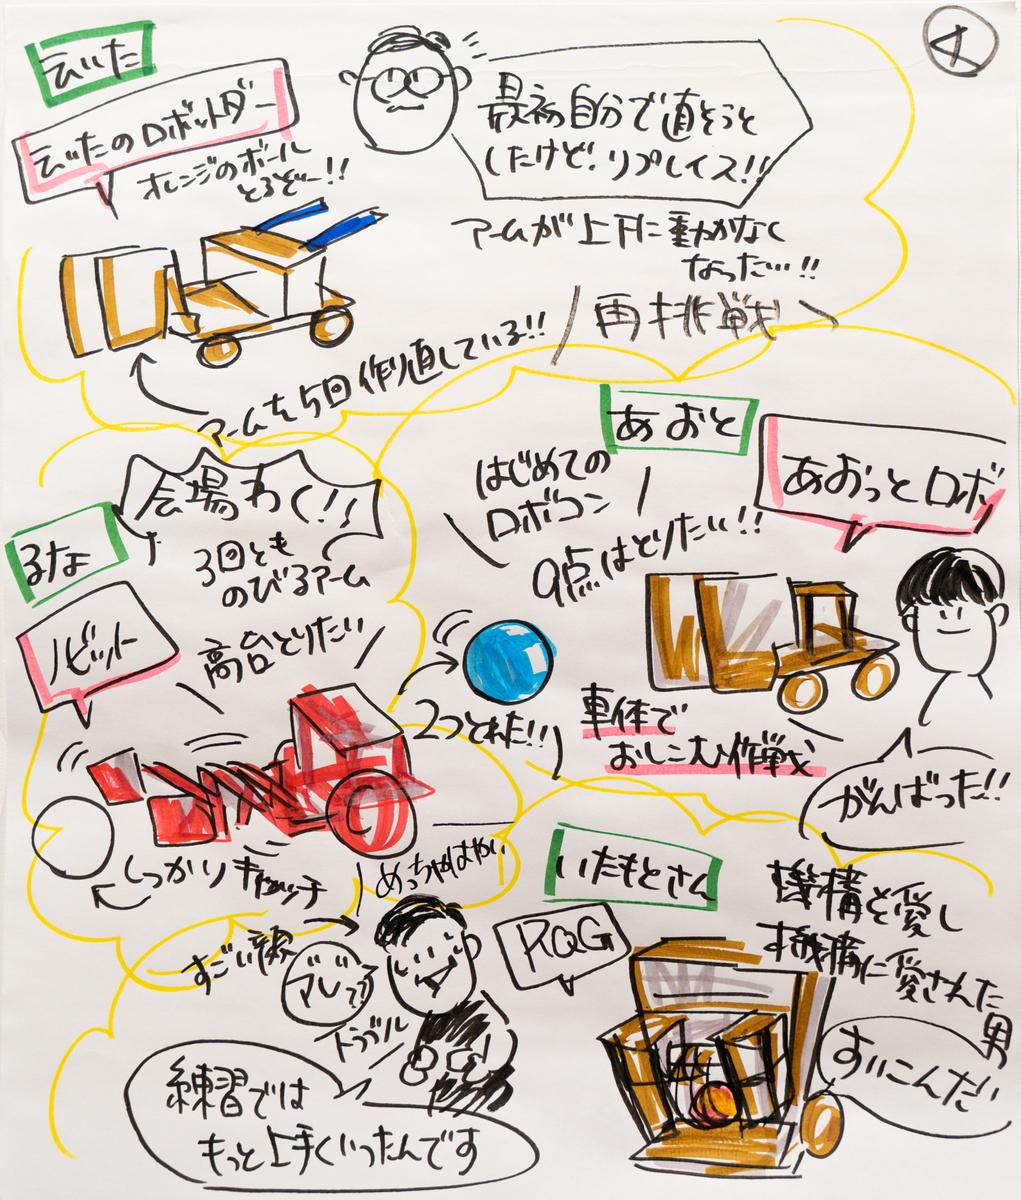 f:id:nakatsuka808:20190924095526j:plain